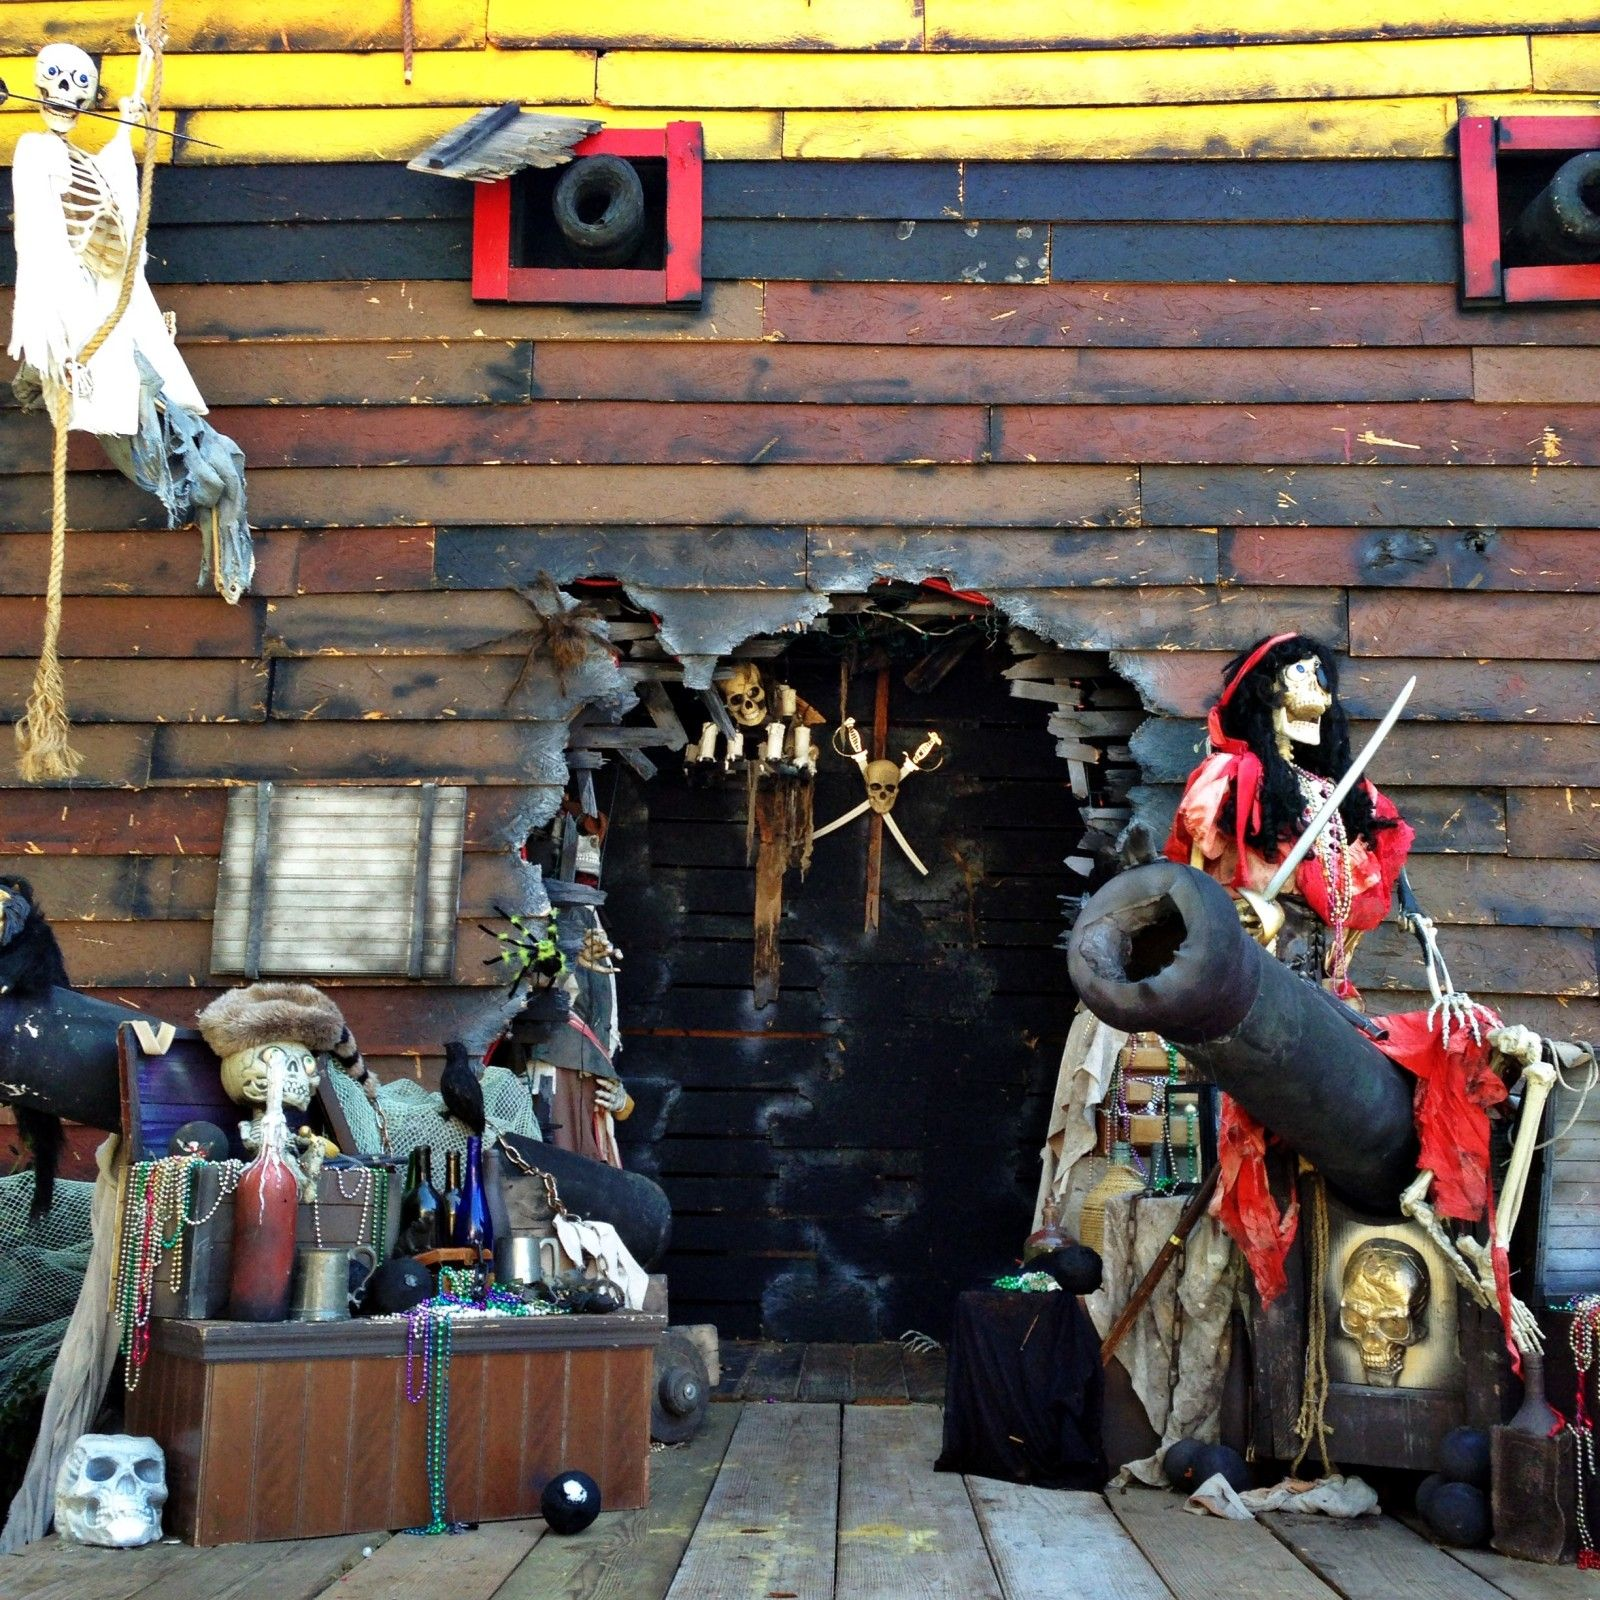 Pirate Ship doorway | Halloween Ideas | Pinterest | Pirate ships ...